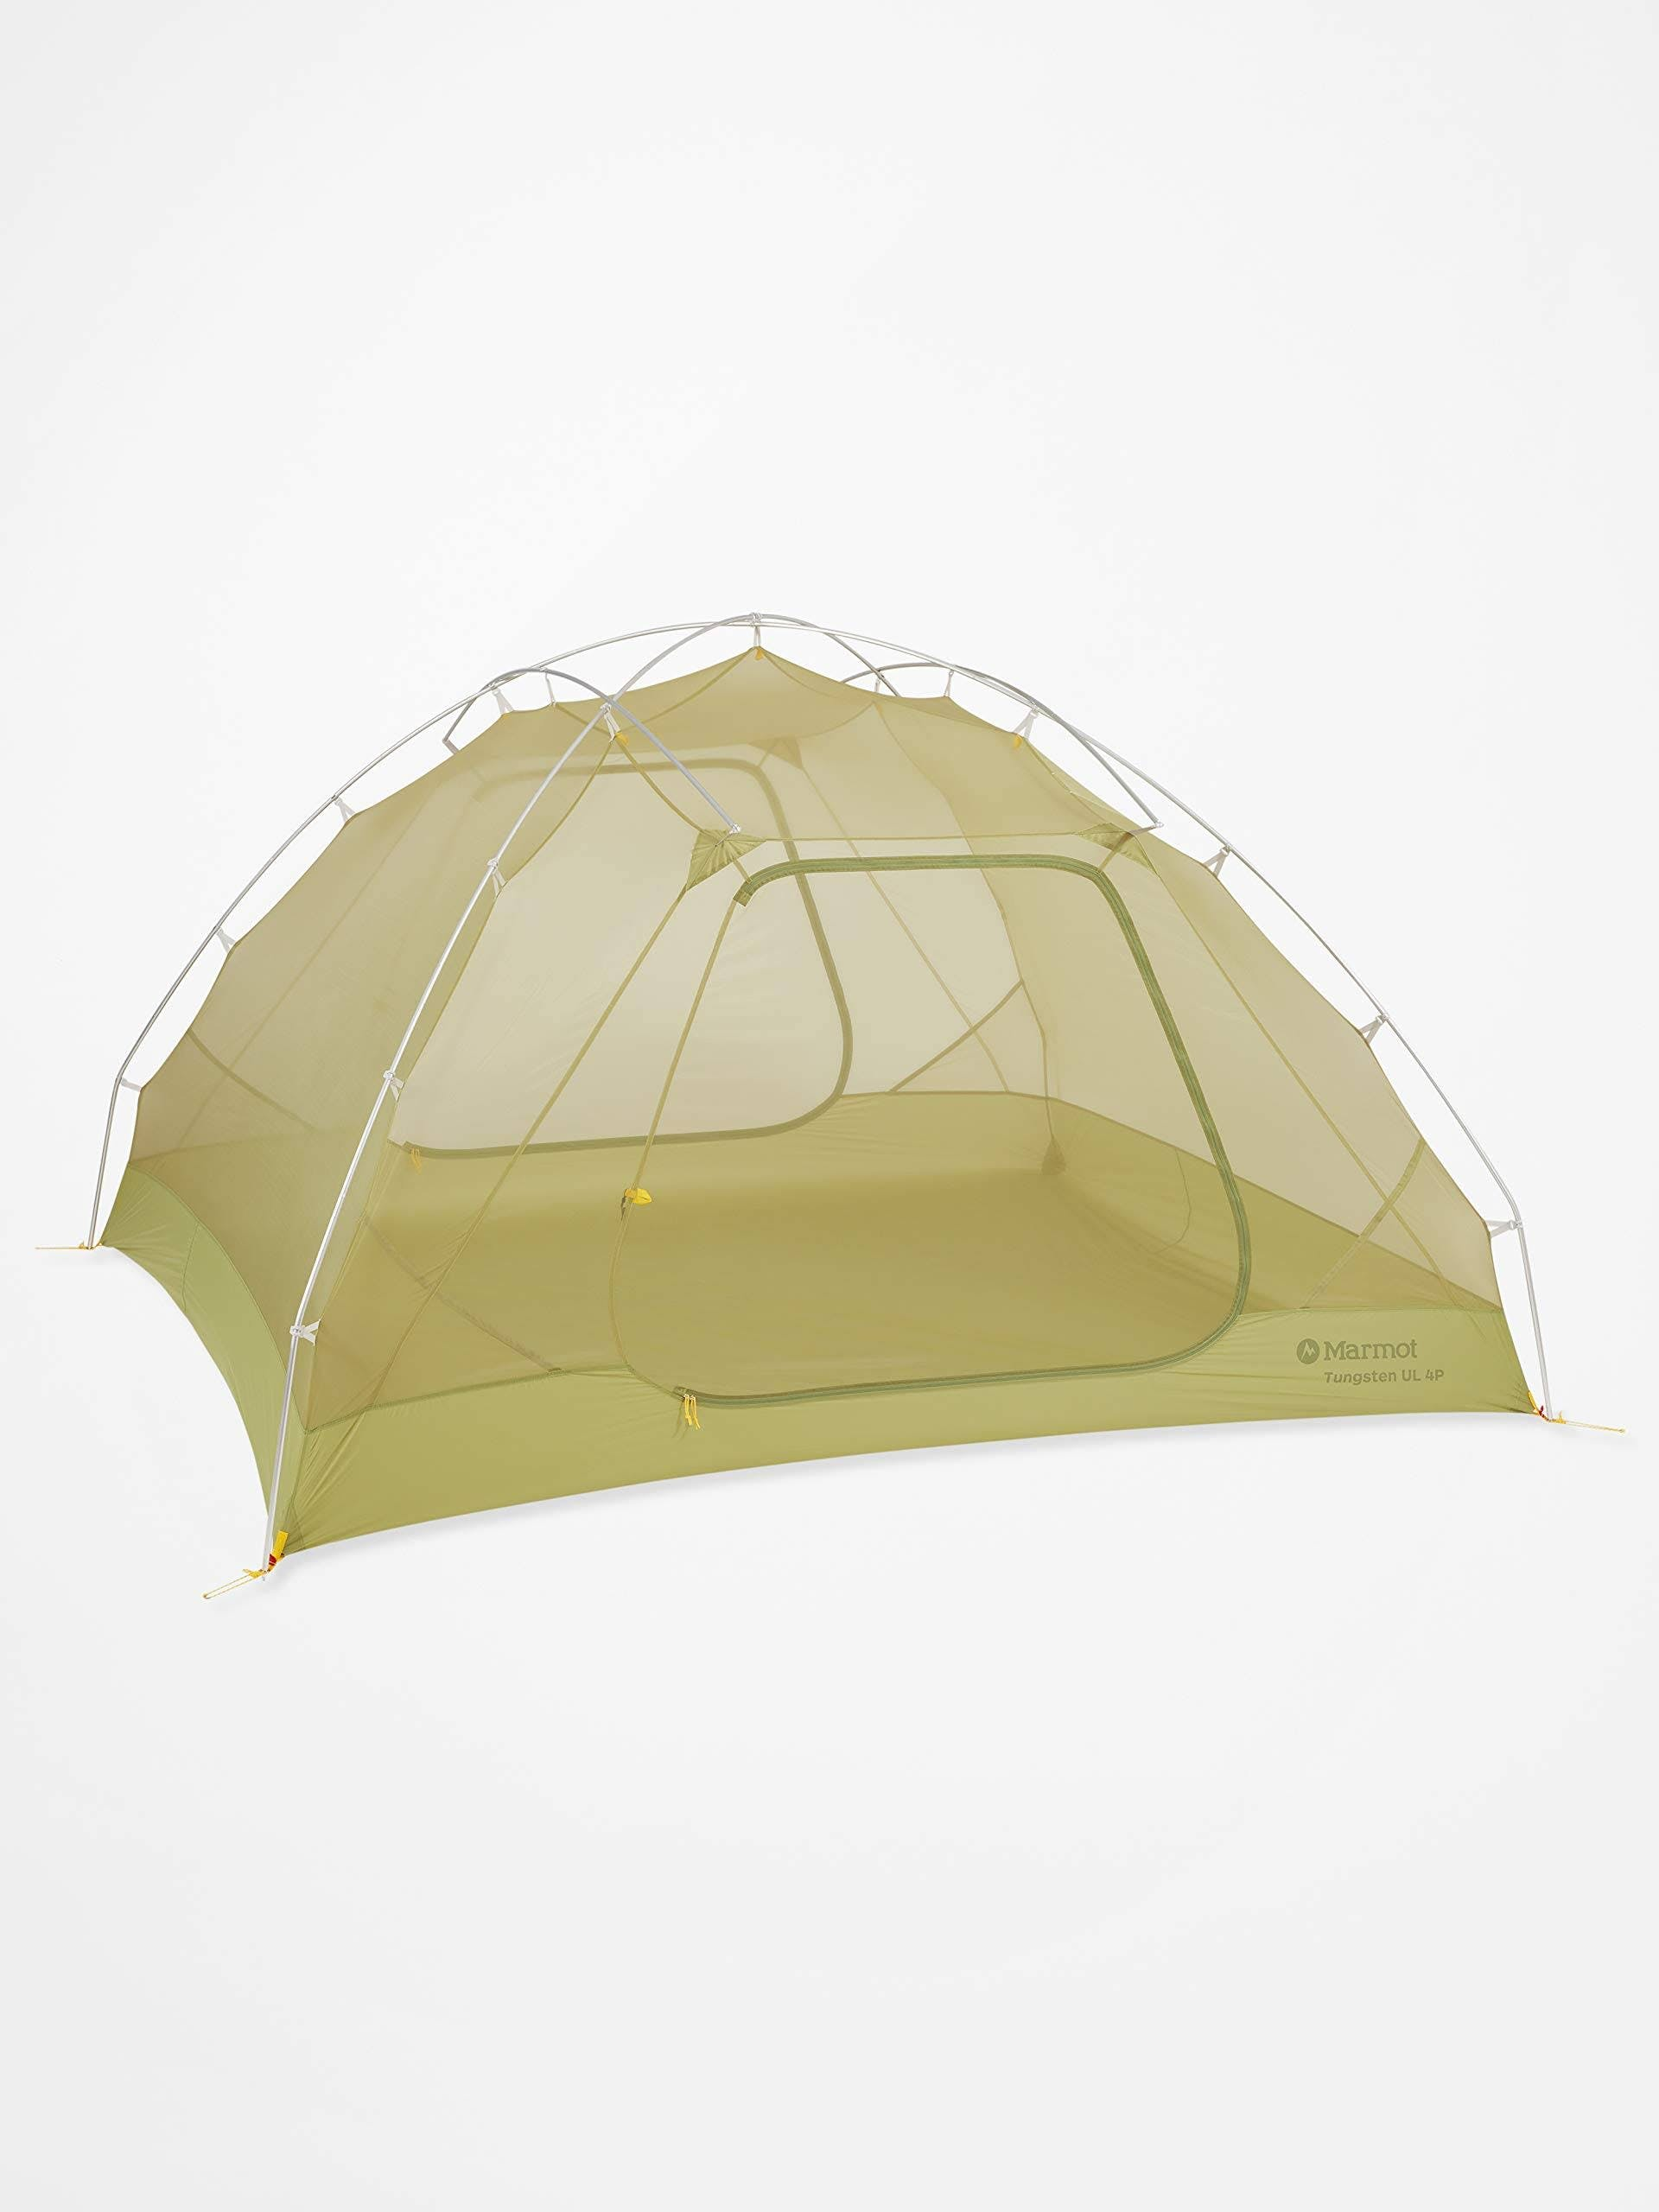 Marmot Tungsten UL 4p Tent